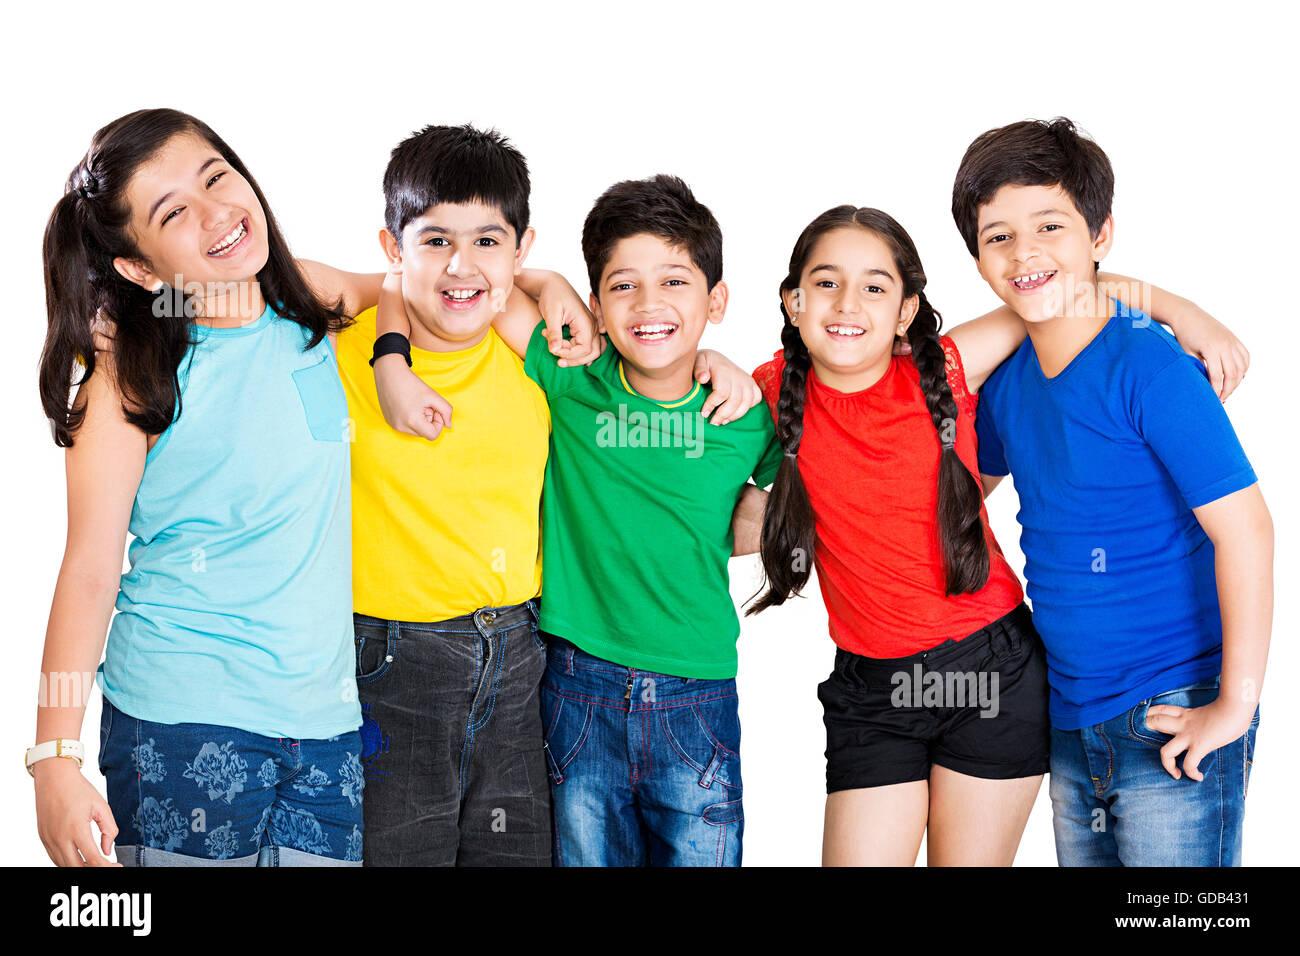 5 Kids Boys And Girls Friends Arm Around Standing Stock Photo Alamy